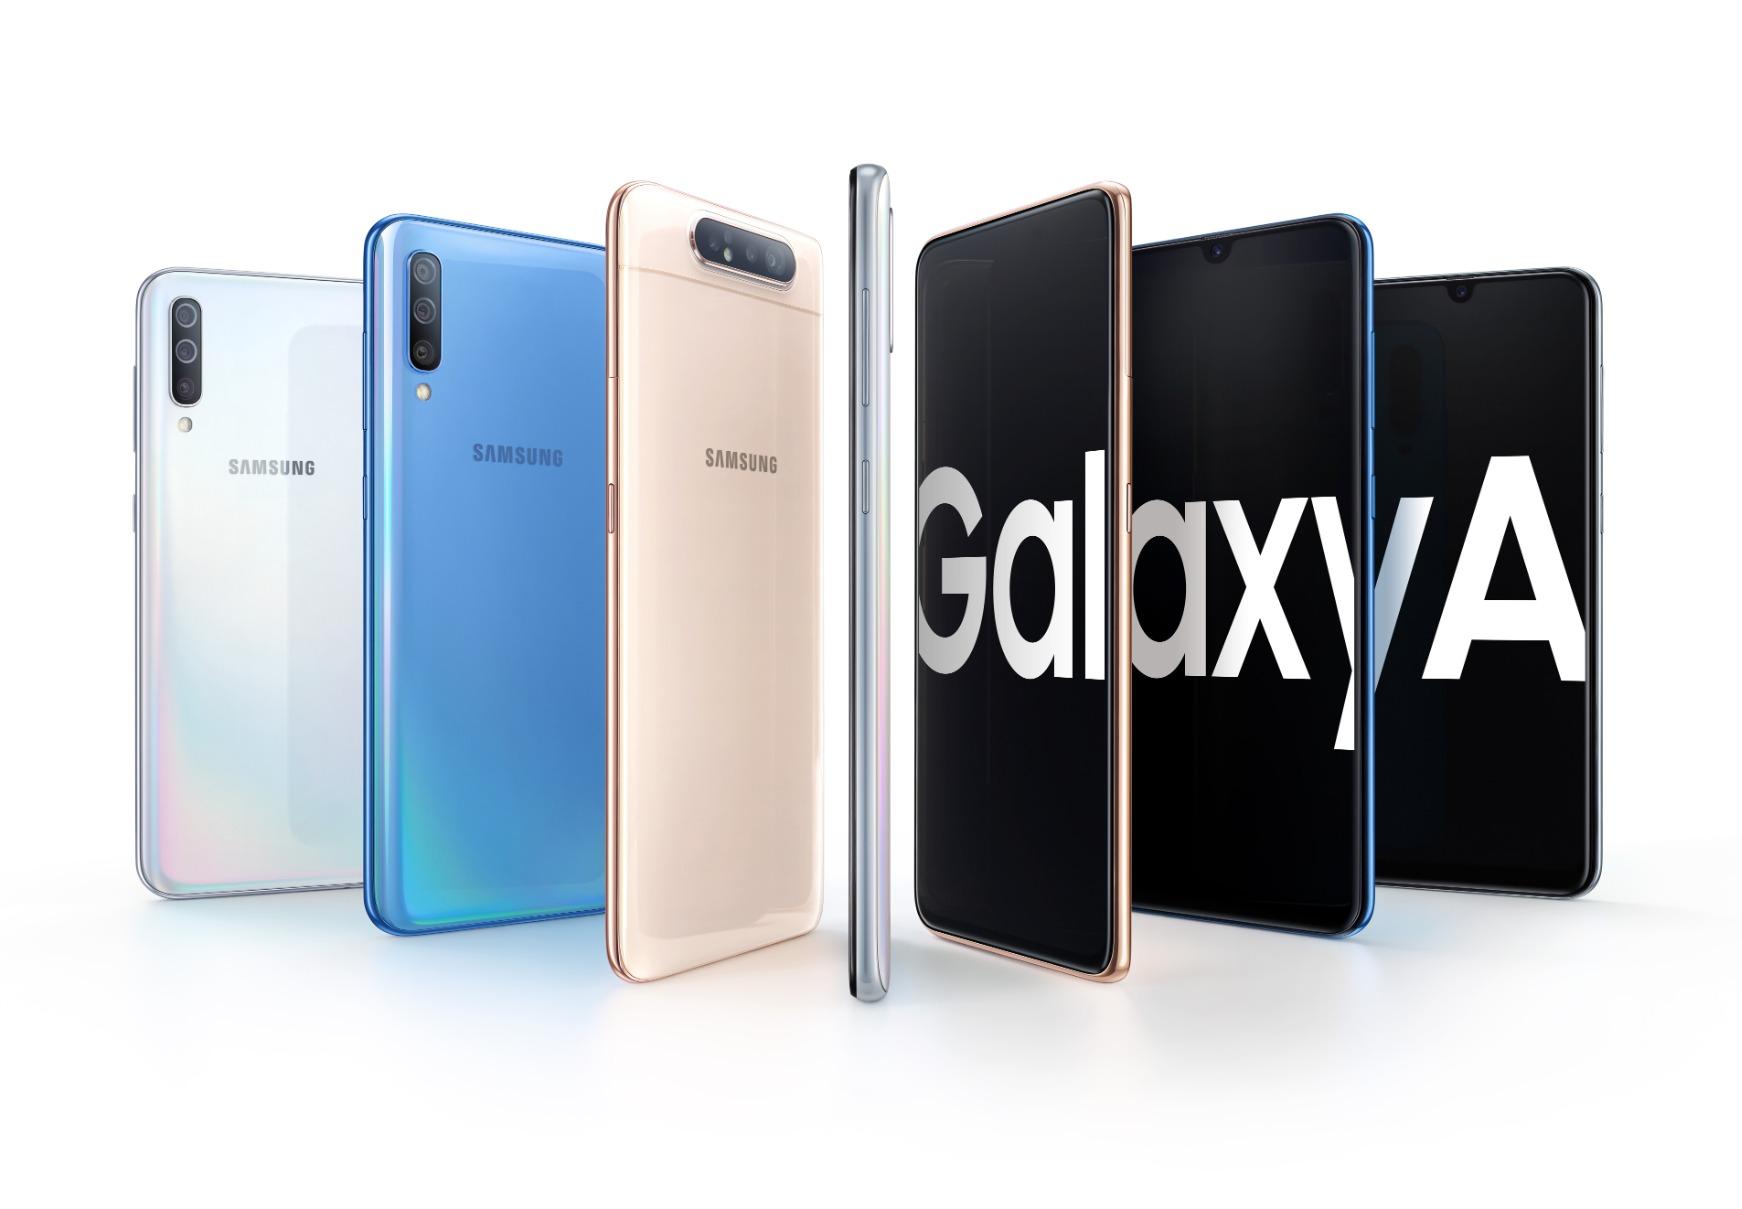 Samsung Galaxy A Familie Header 2019